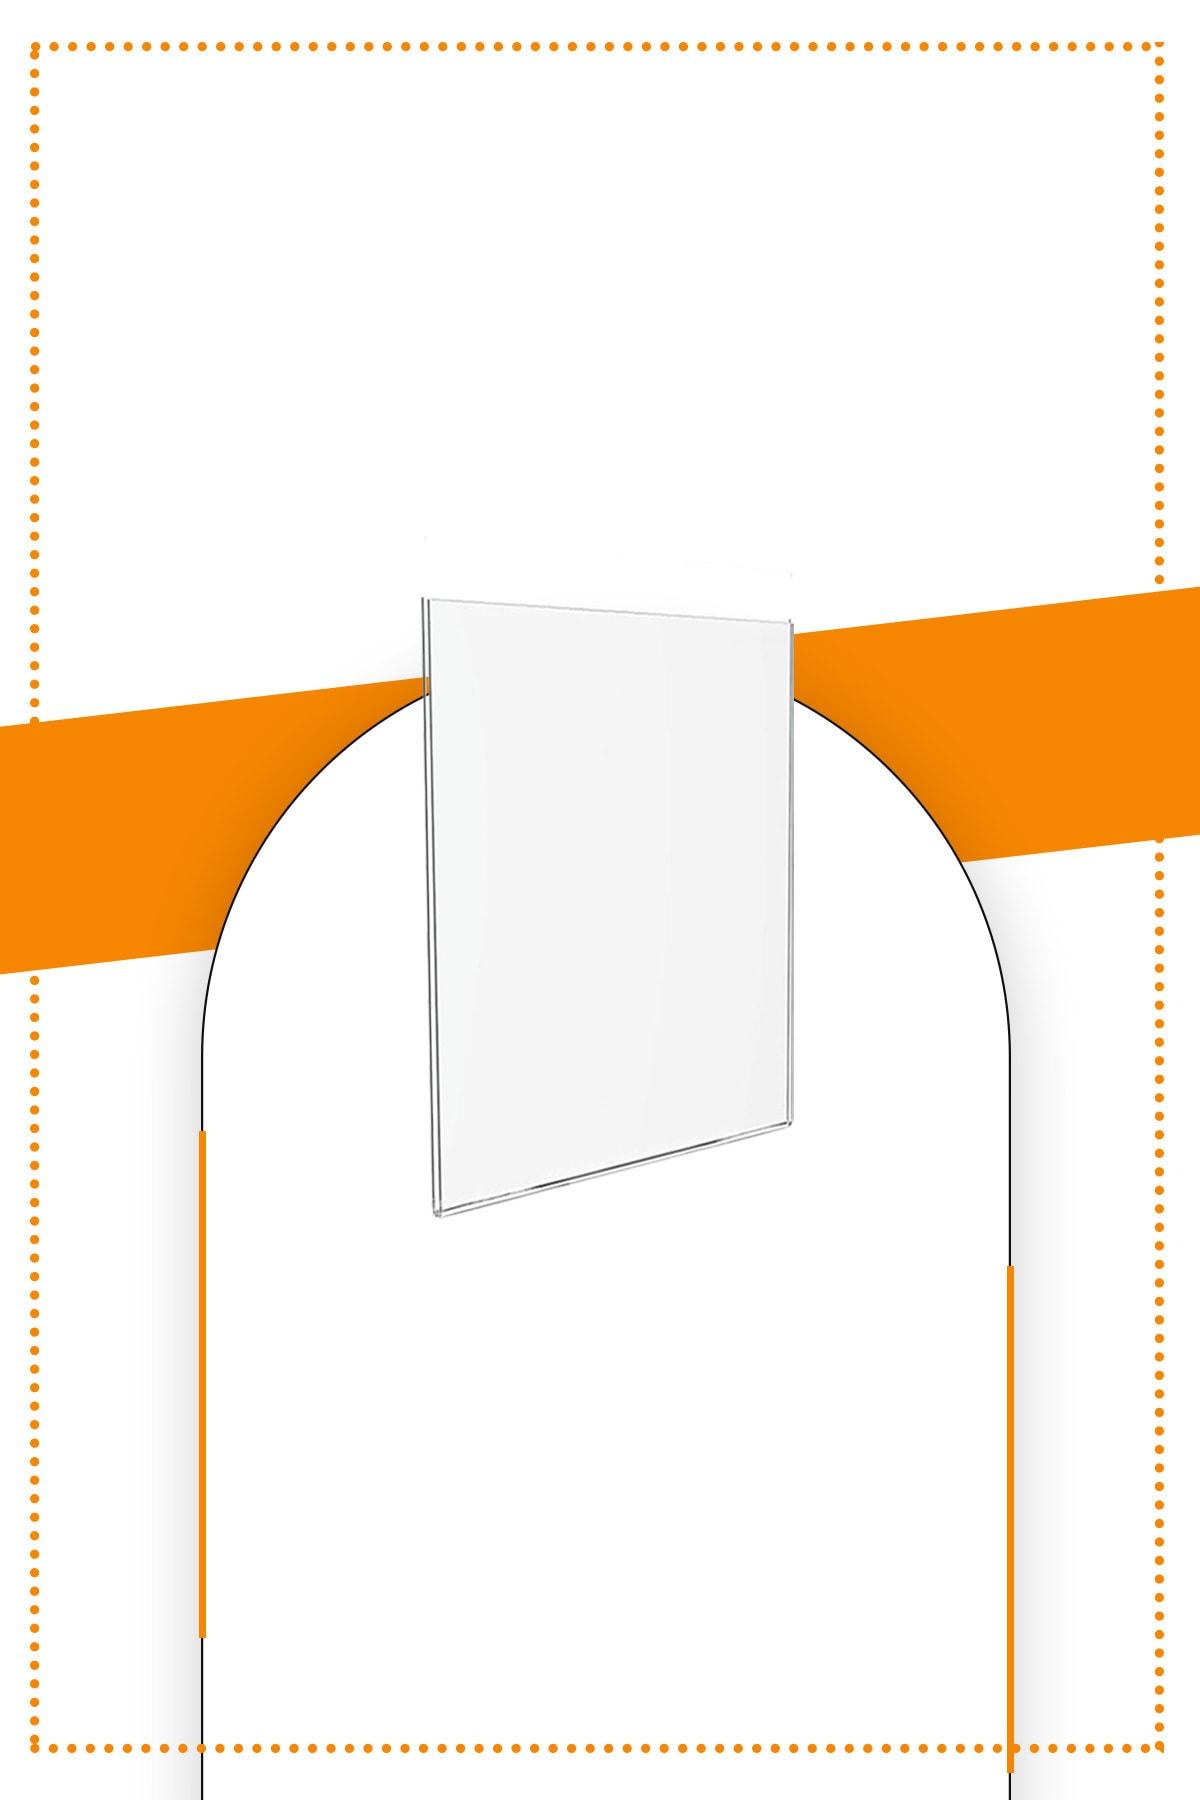 Etias Reklam A7 U Tipi Dikey Masa Üstü 2.8 Mm Şeffaf Pleksi Föylük /  Broşürlük Fiyatı, Yorumları - TRENDYOL